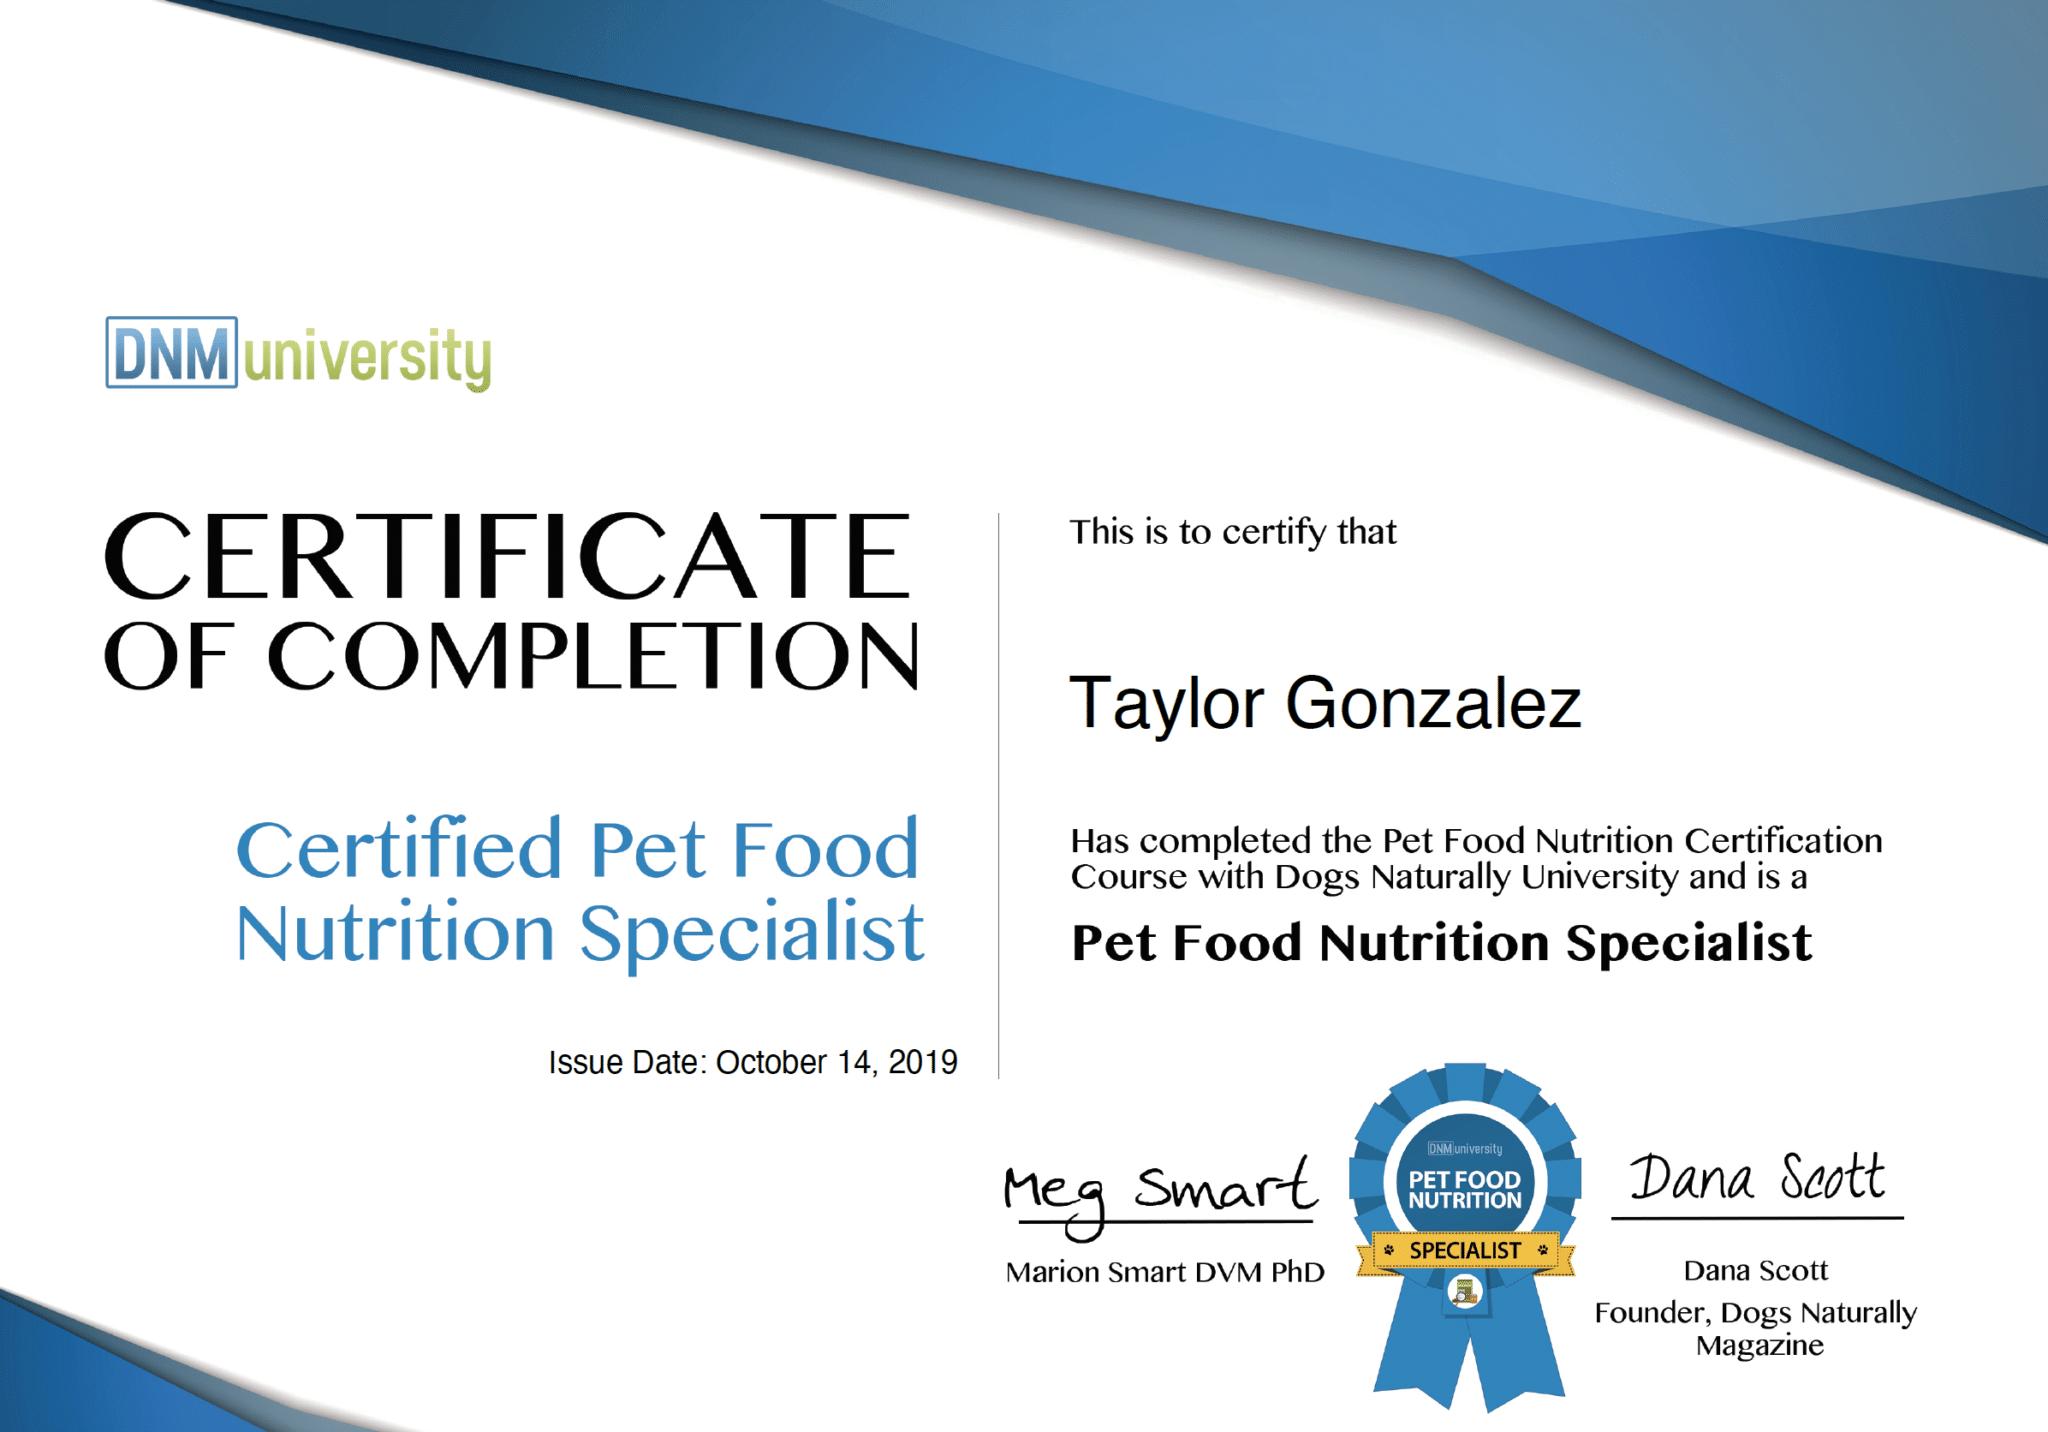 Certified Pet Food Nutrition Specialist Certificate - Taylor